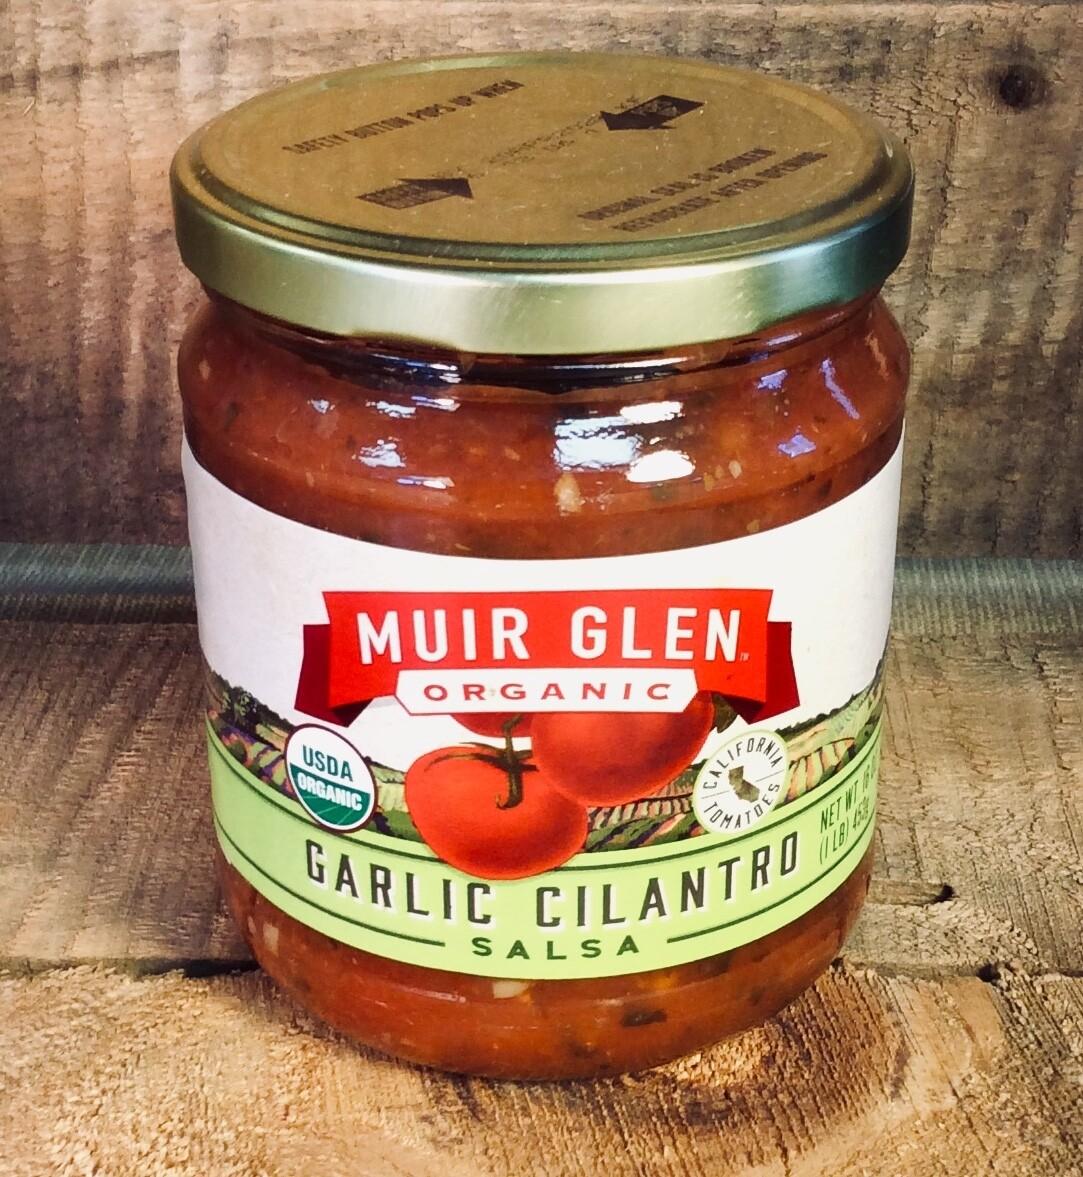 Salsa, organic, garlic cilantro, 16 ounce; each; Muir Glen